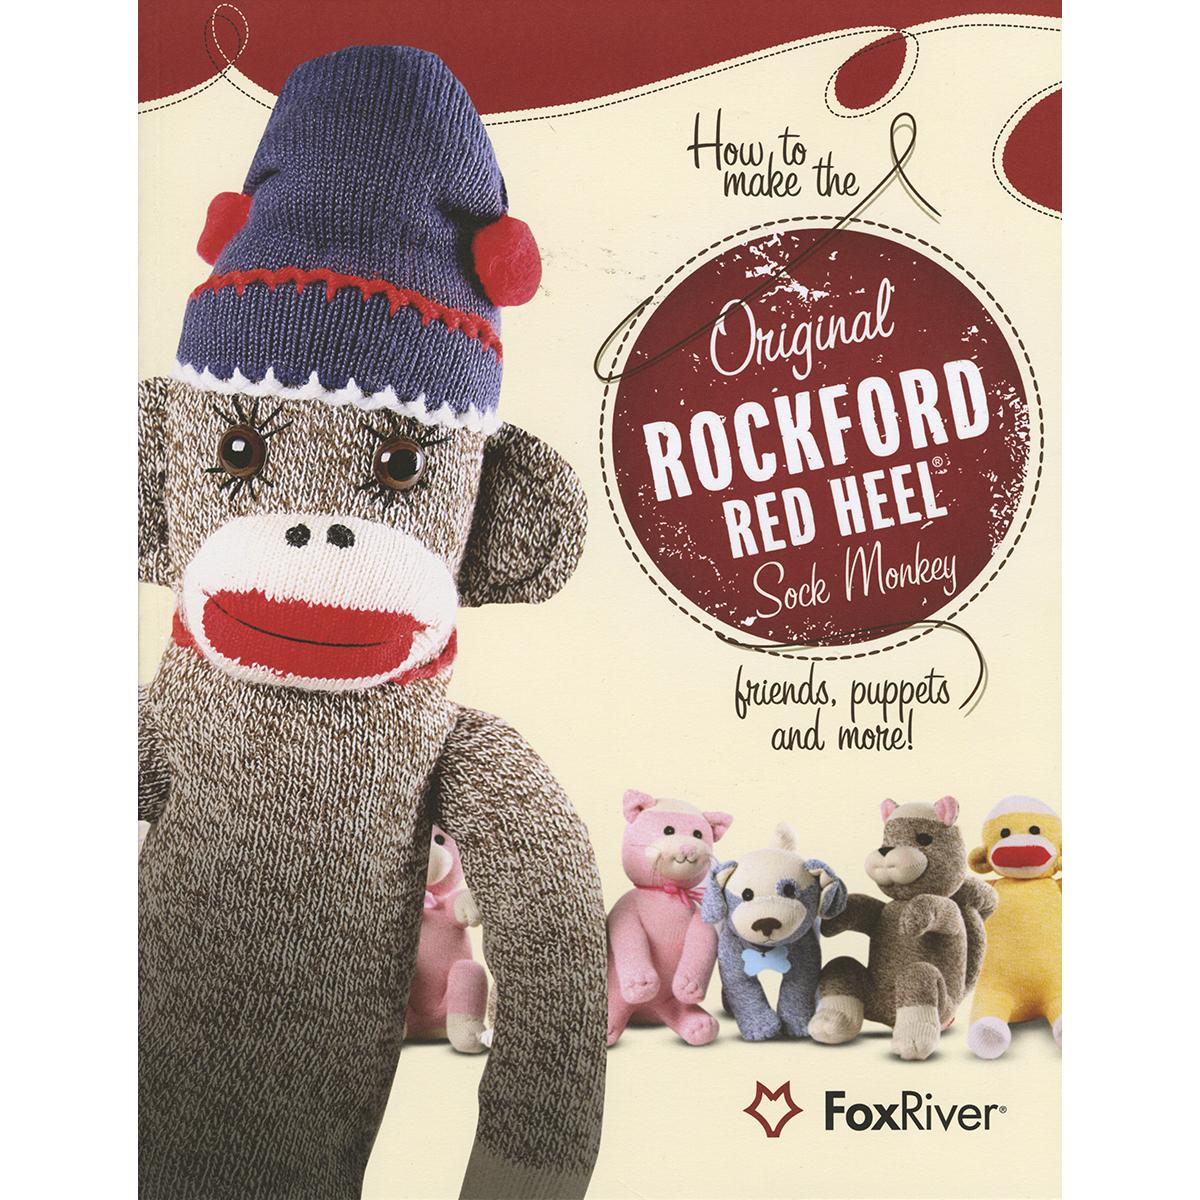 How to Make the Original Rockford Red Heel Sock Monkey